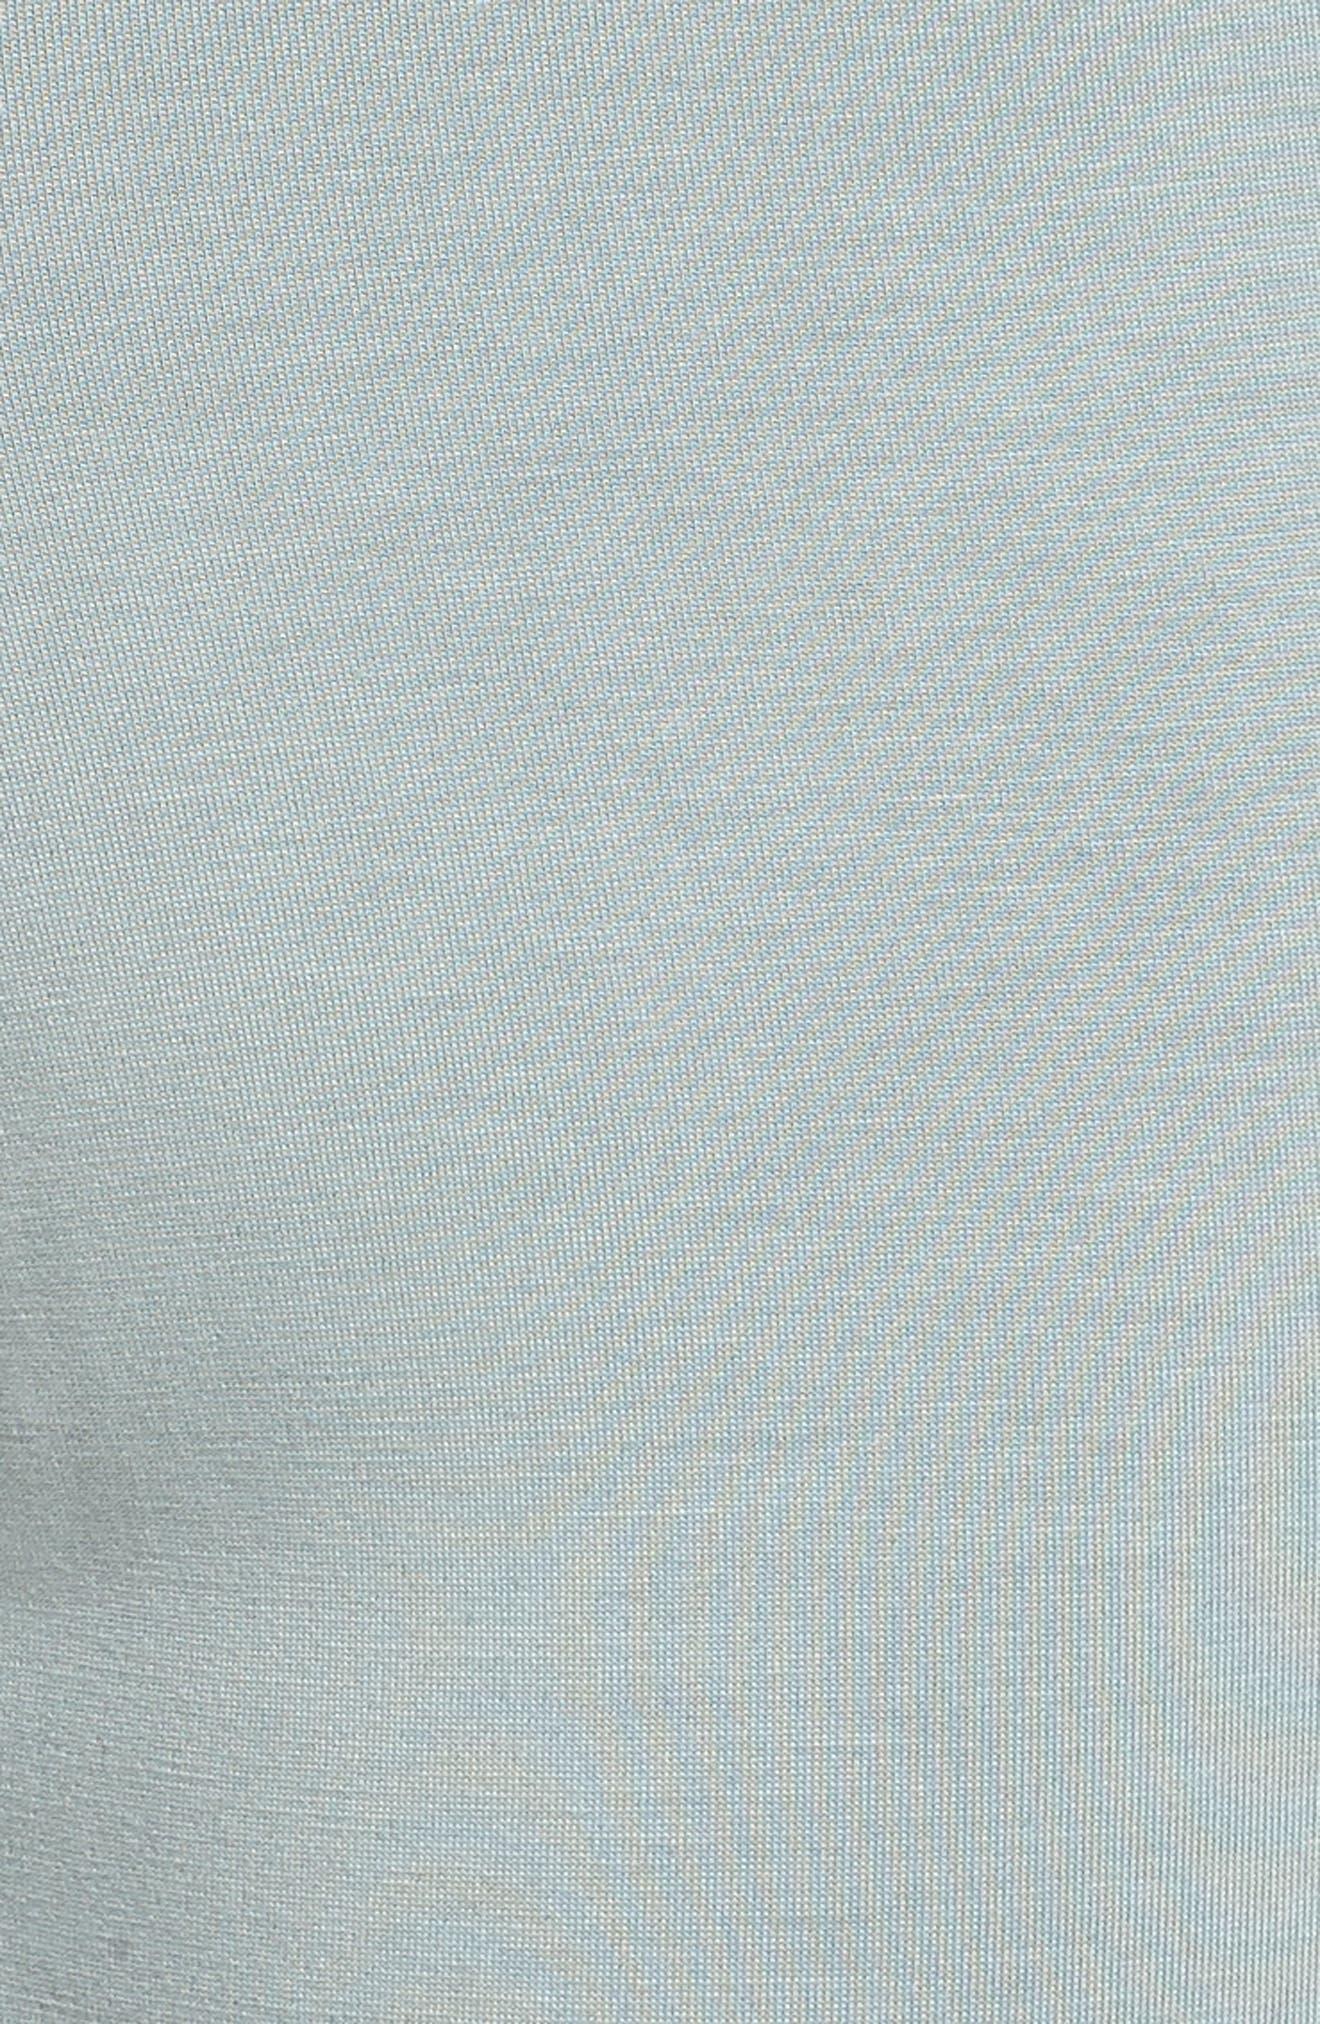 Aden Ruffle Hem Lounge Pants,                             Alternate thumbnail 5, color,                             MINERAL SAGE